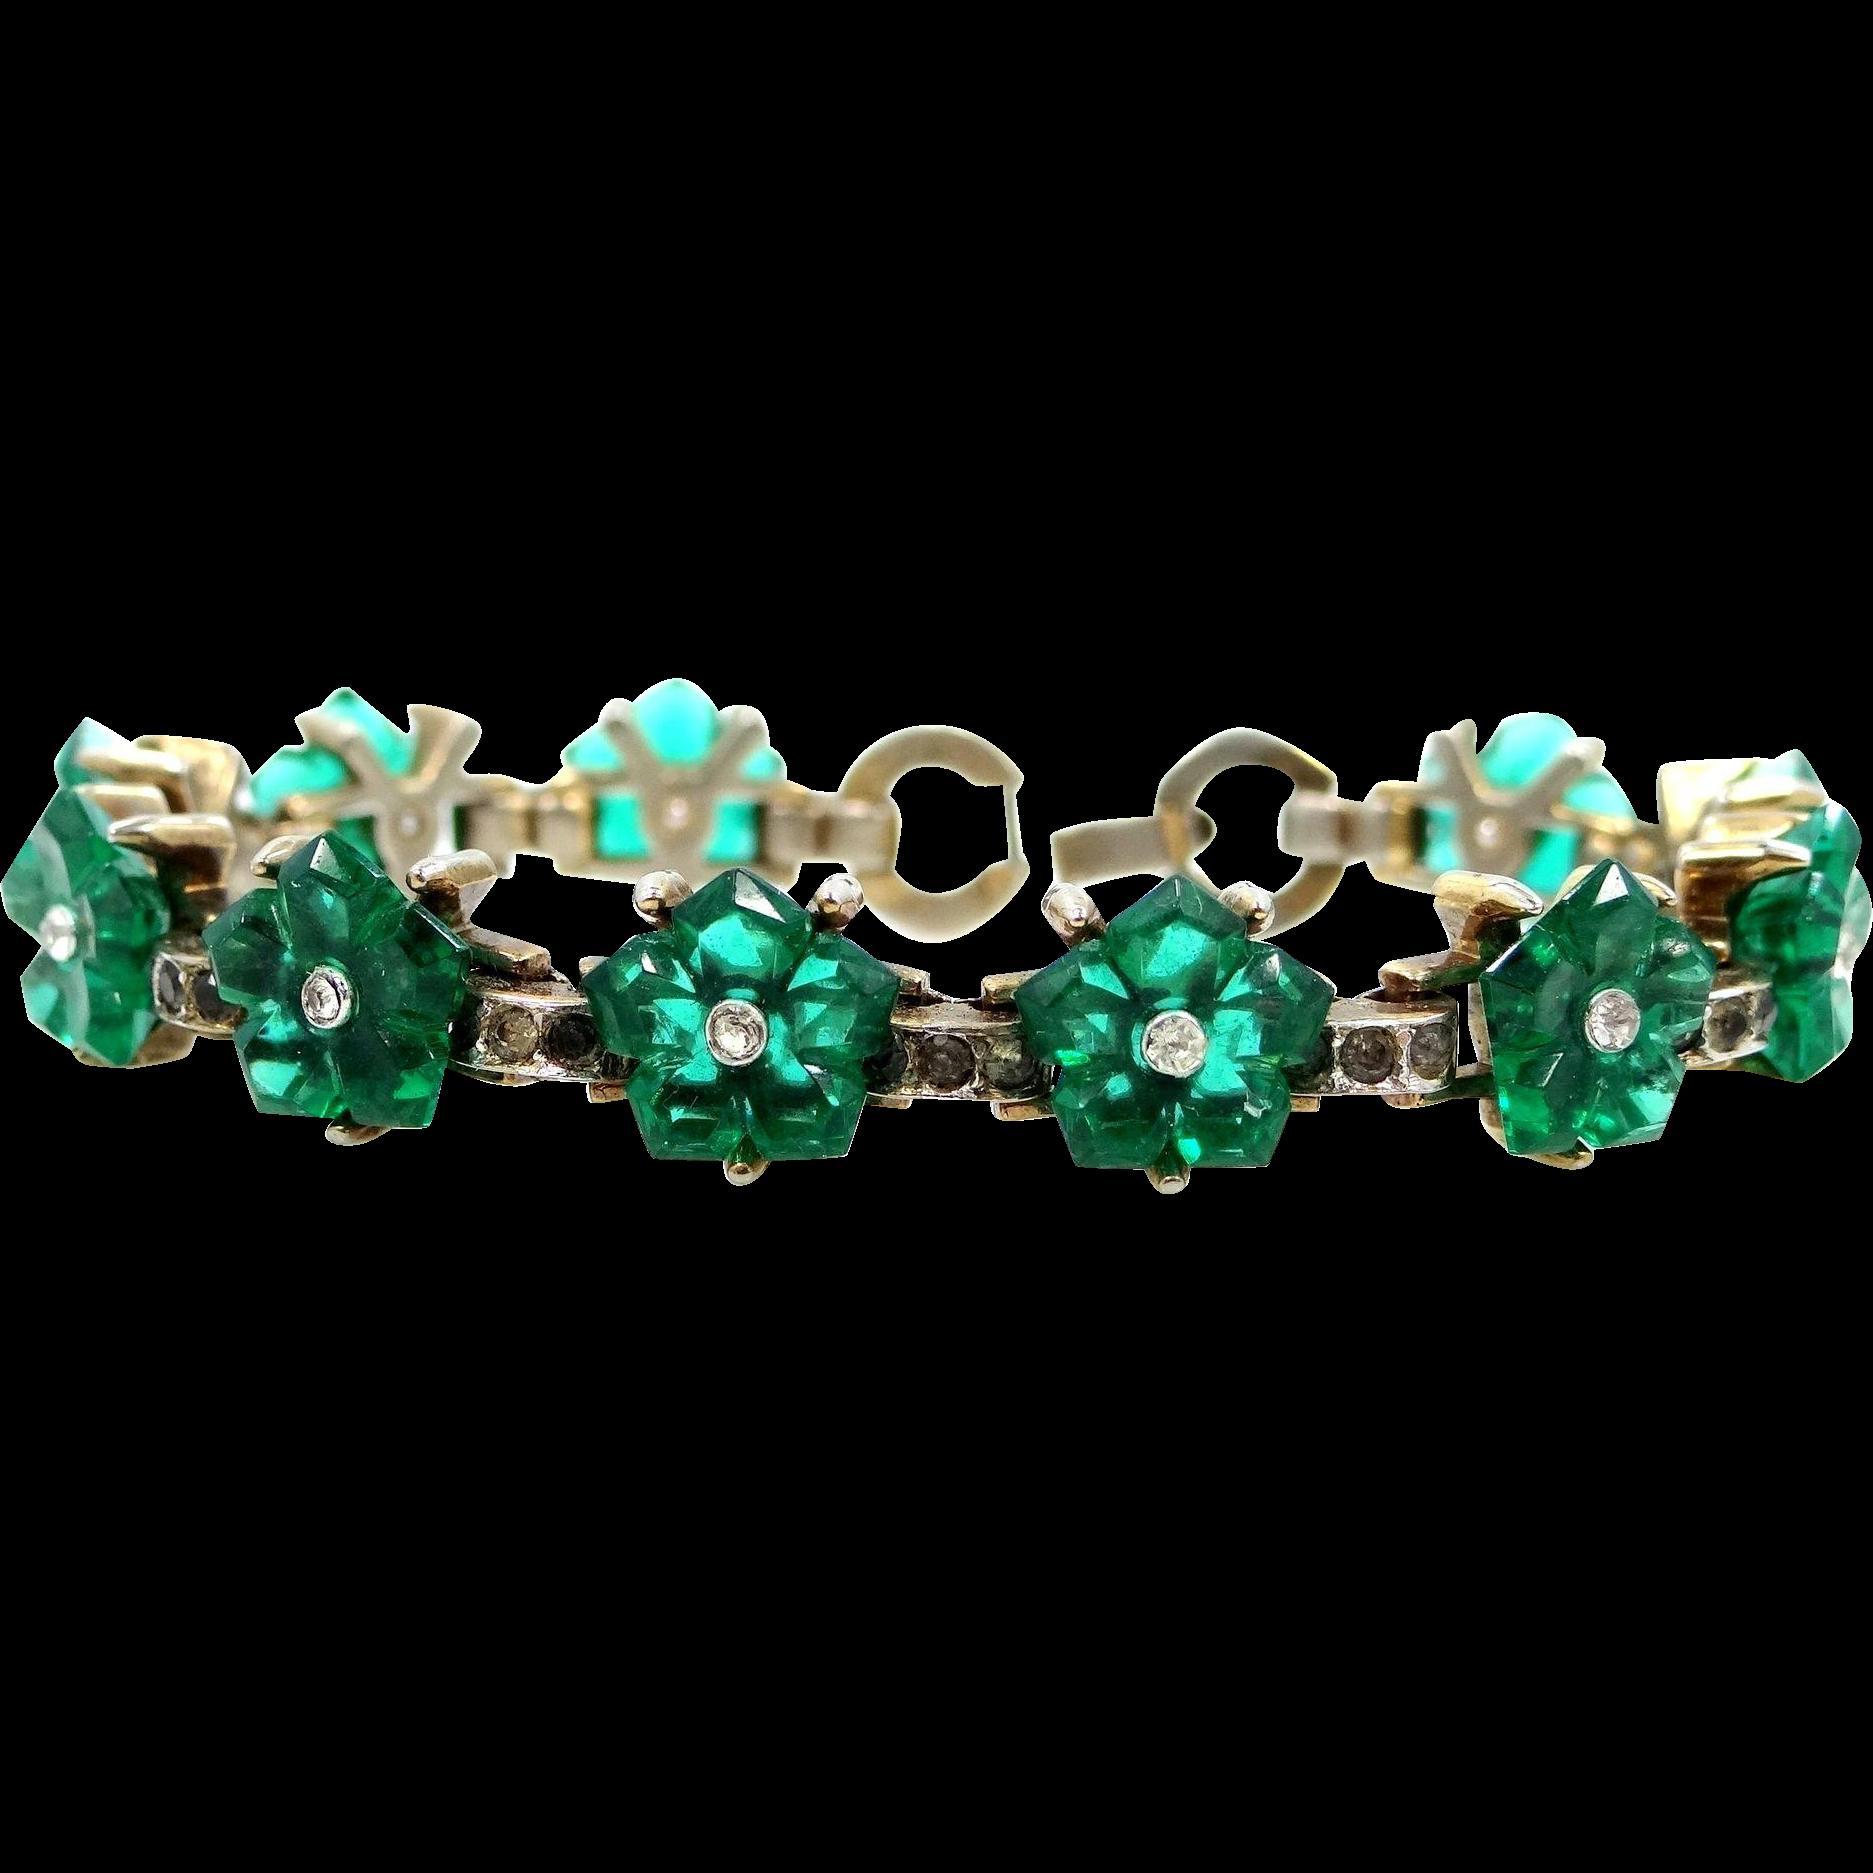 Trifari 'Alfred Philippe' Emerald Glass Flowers Bracelet 1944